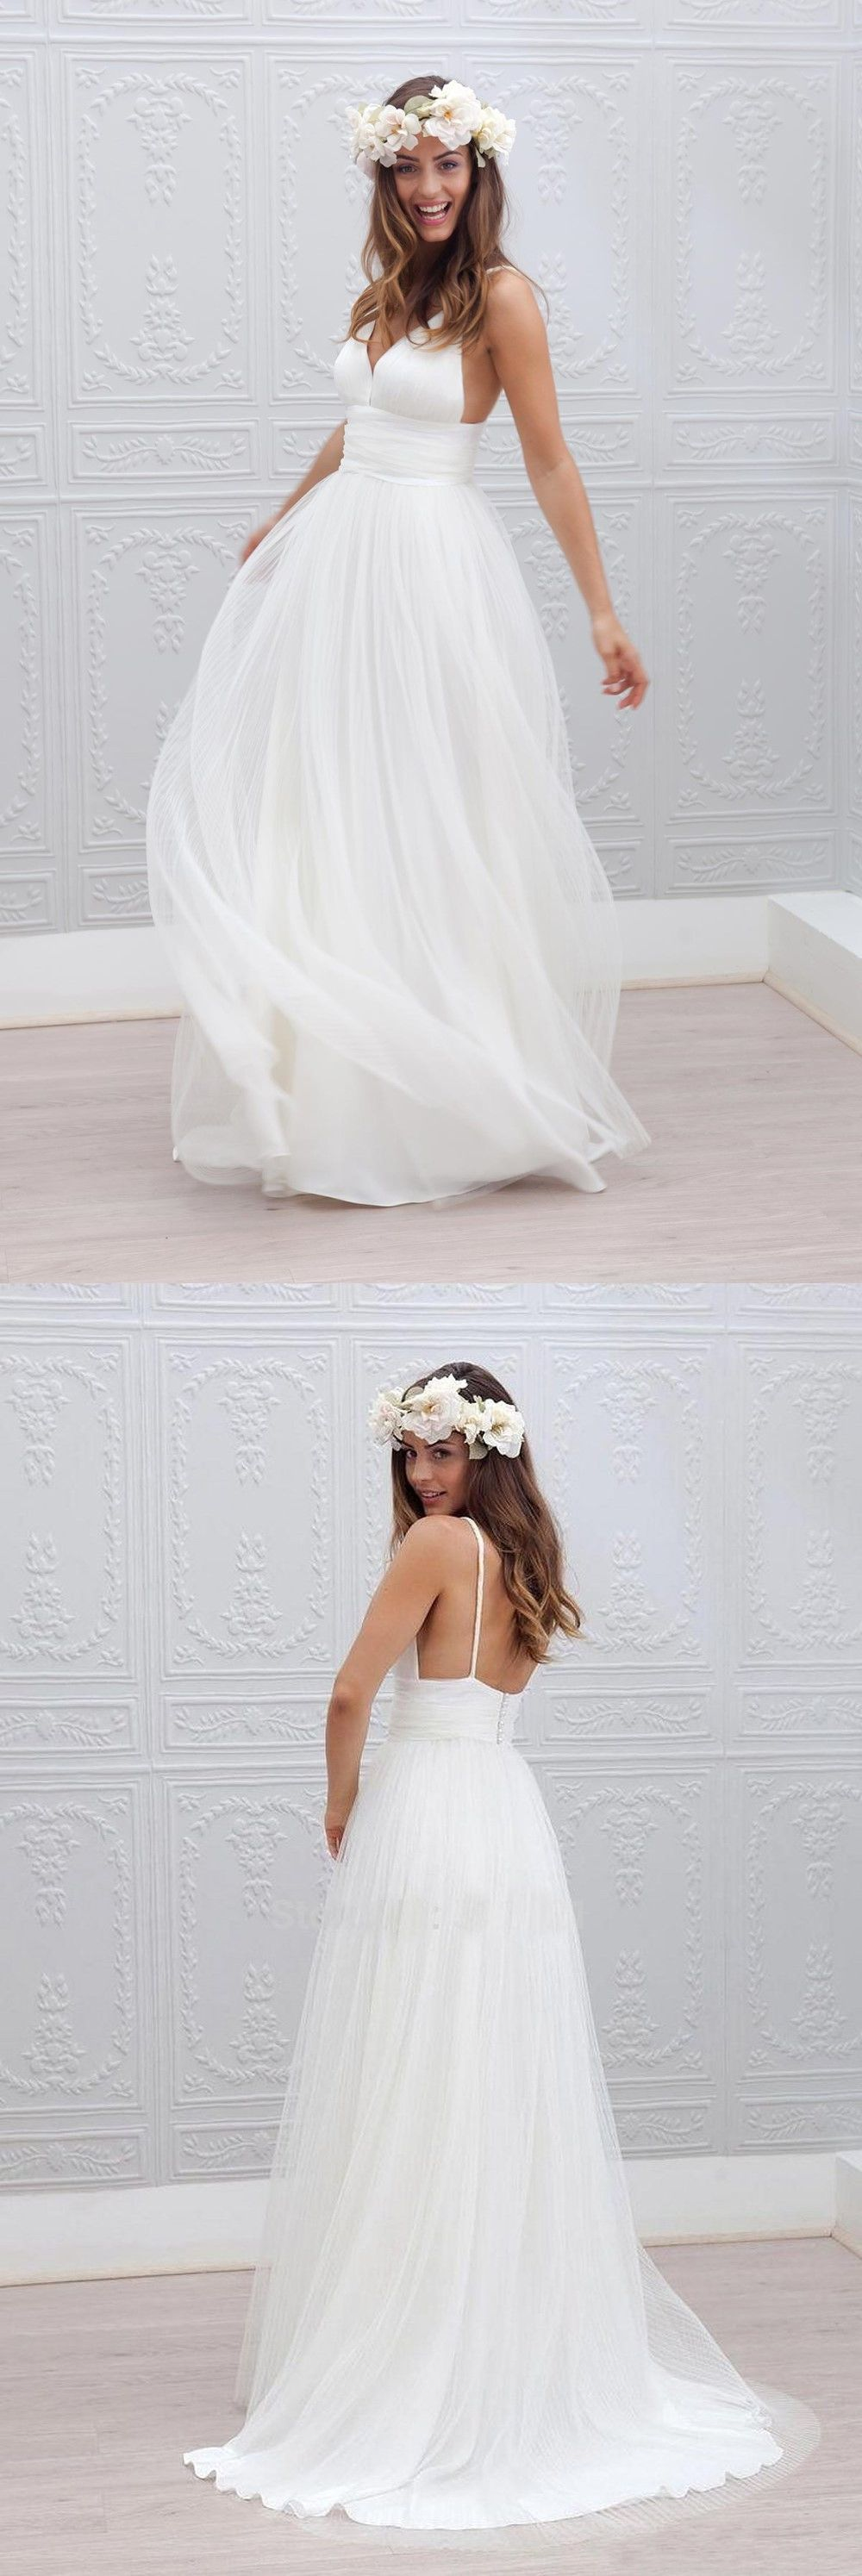 beach wedding dresses white chiffon sexy deep v neck backless